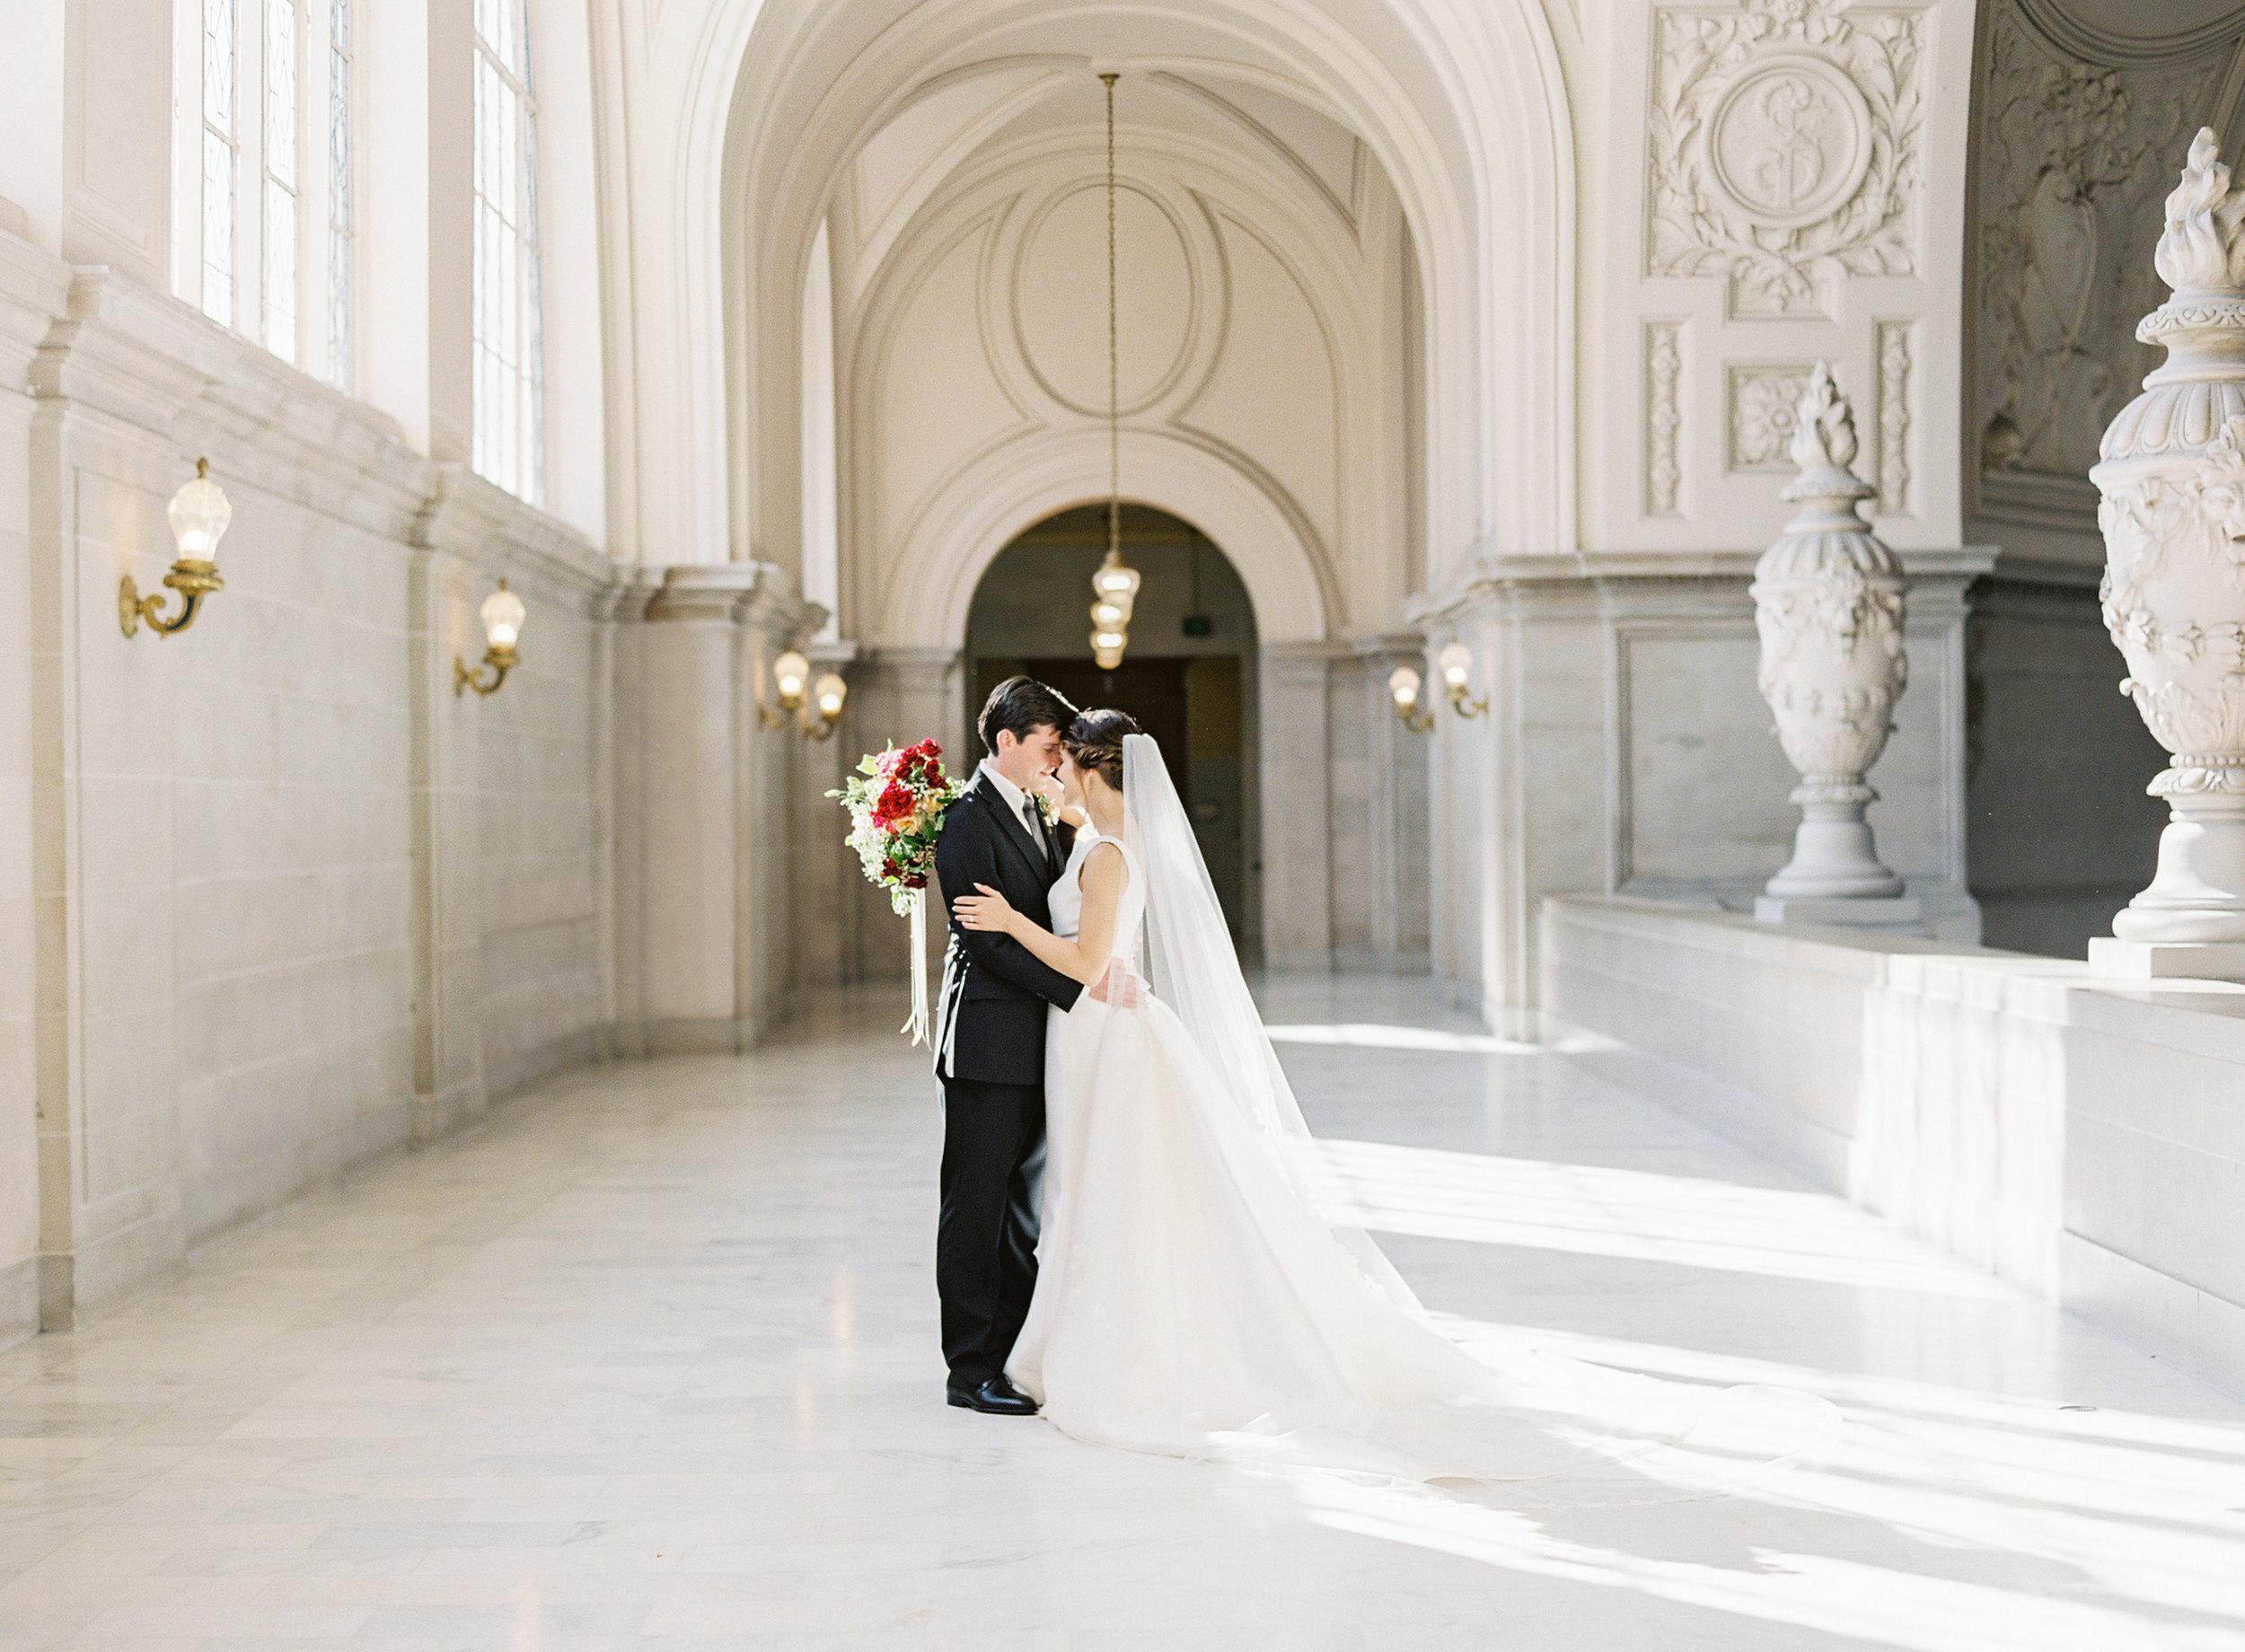 Meghan Mehan Photography - California Wedding Photographer | San Francisco City Hall Wedding 030.jpg